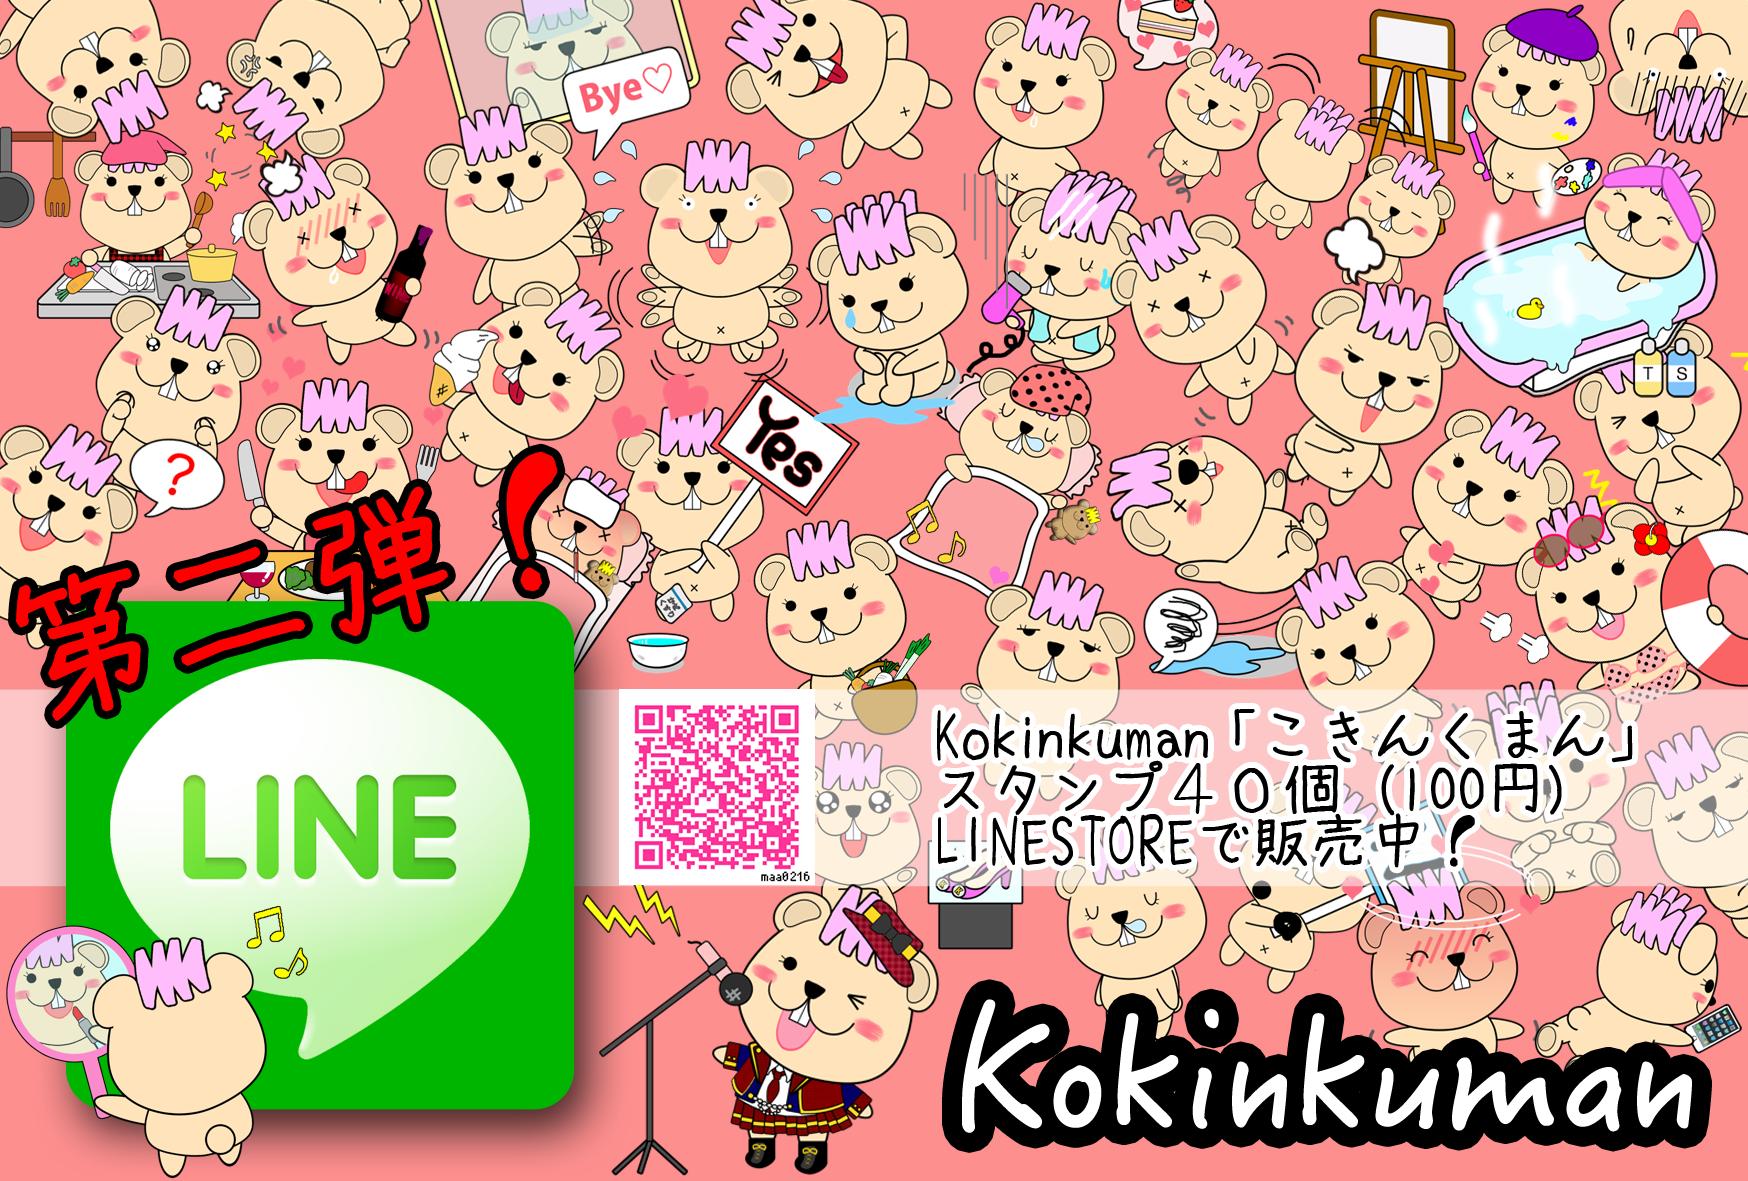 [LINE] LINEスタンプ「Kokinkuman」販売開始!